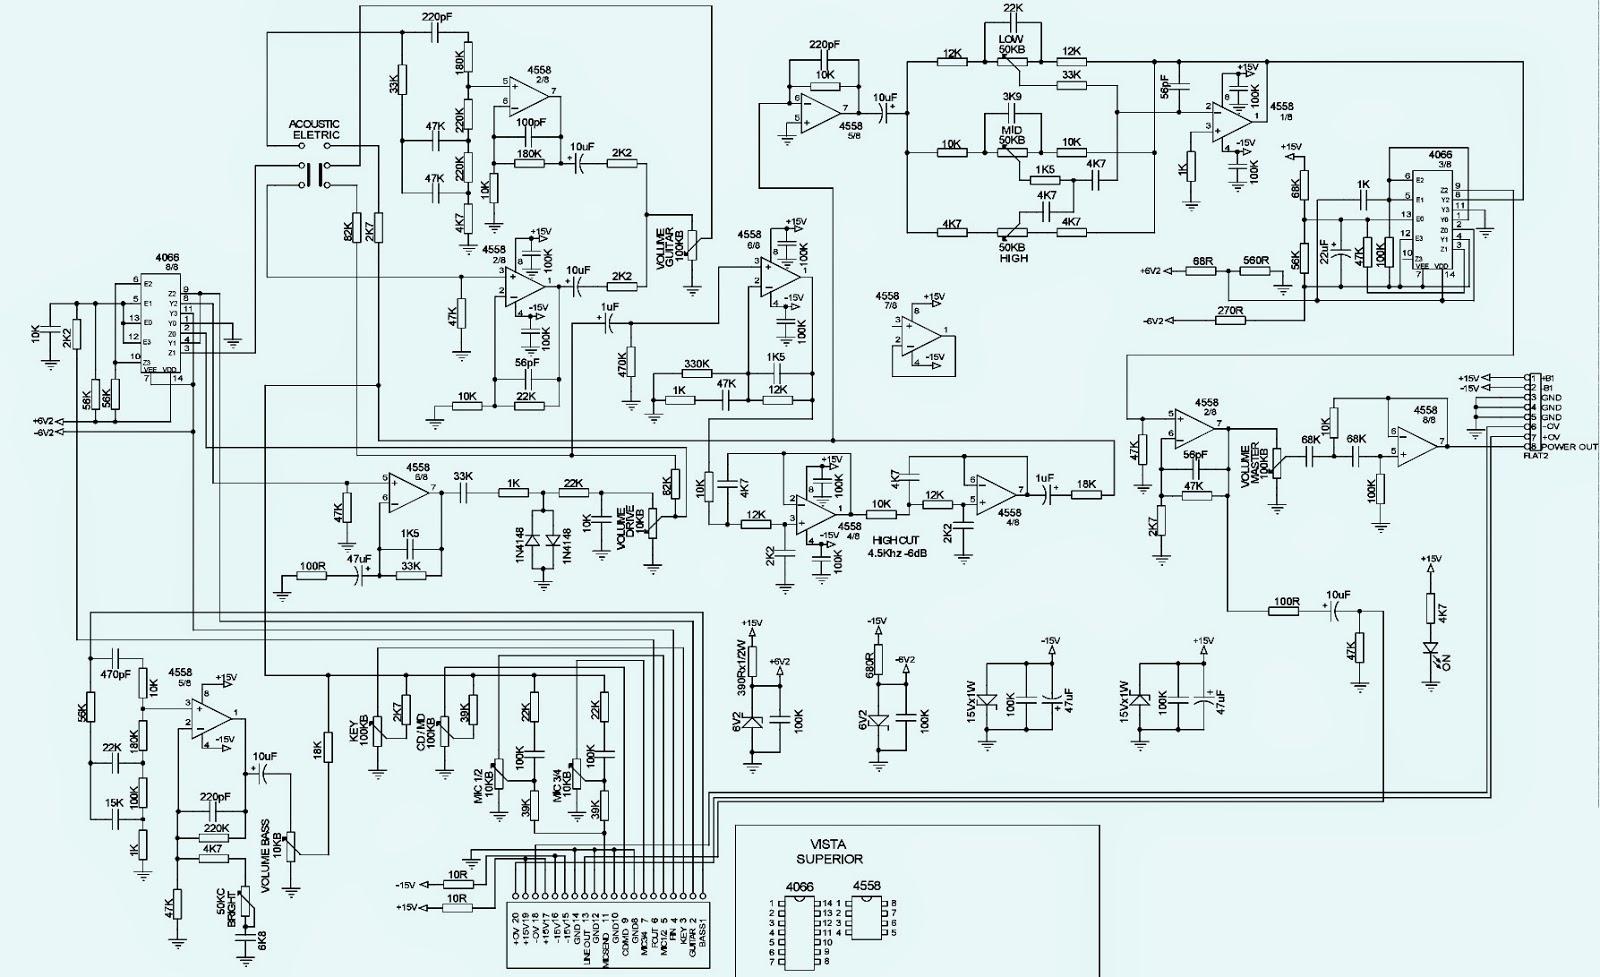 electro help caixa ciclotron nprc 500 schematic diagram. Black Bedroom Furniture Sets. Home Design Ideas